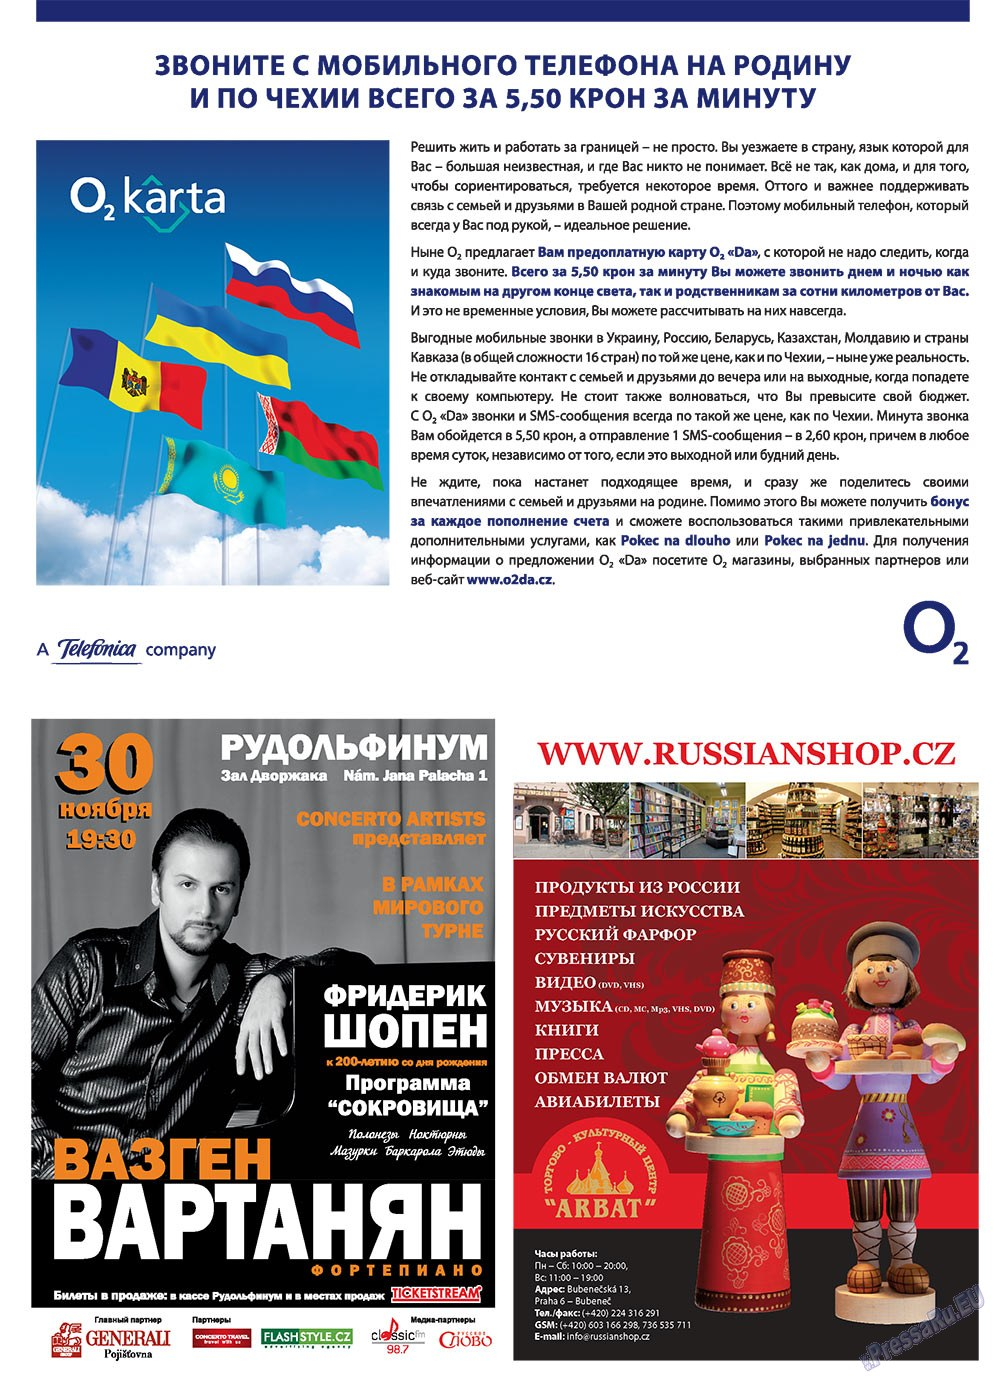 Артек (журнал). 2010 год, номер 5, стр. 2